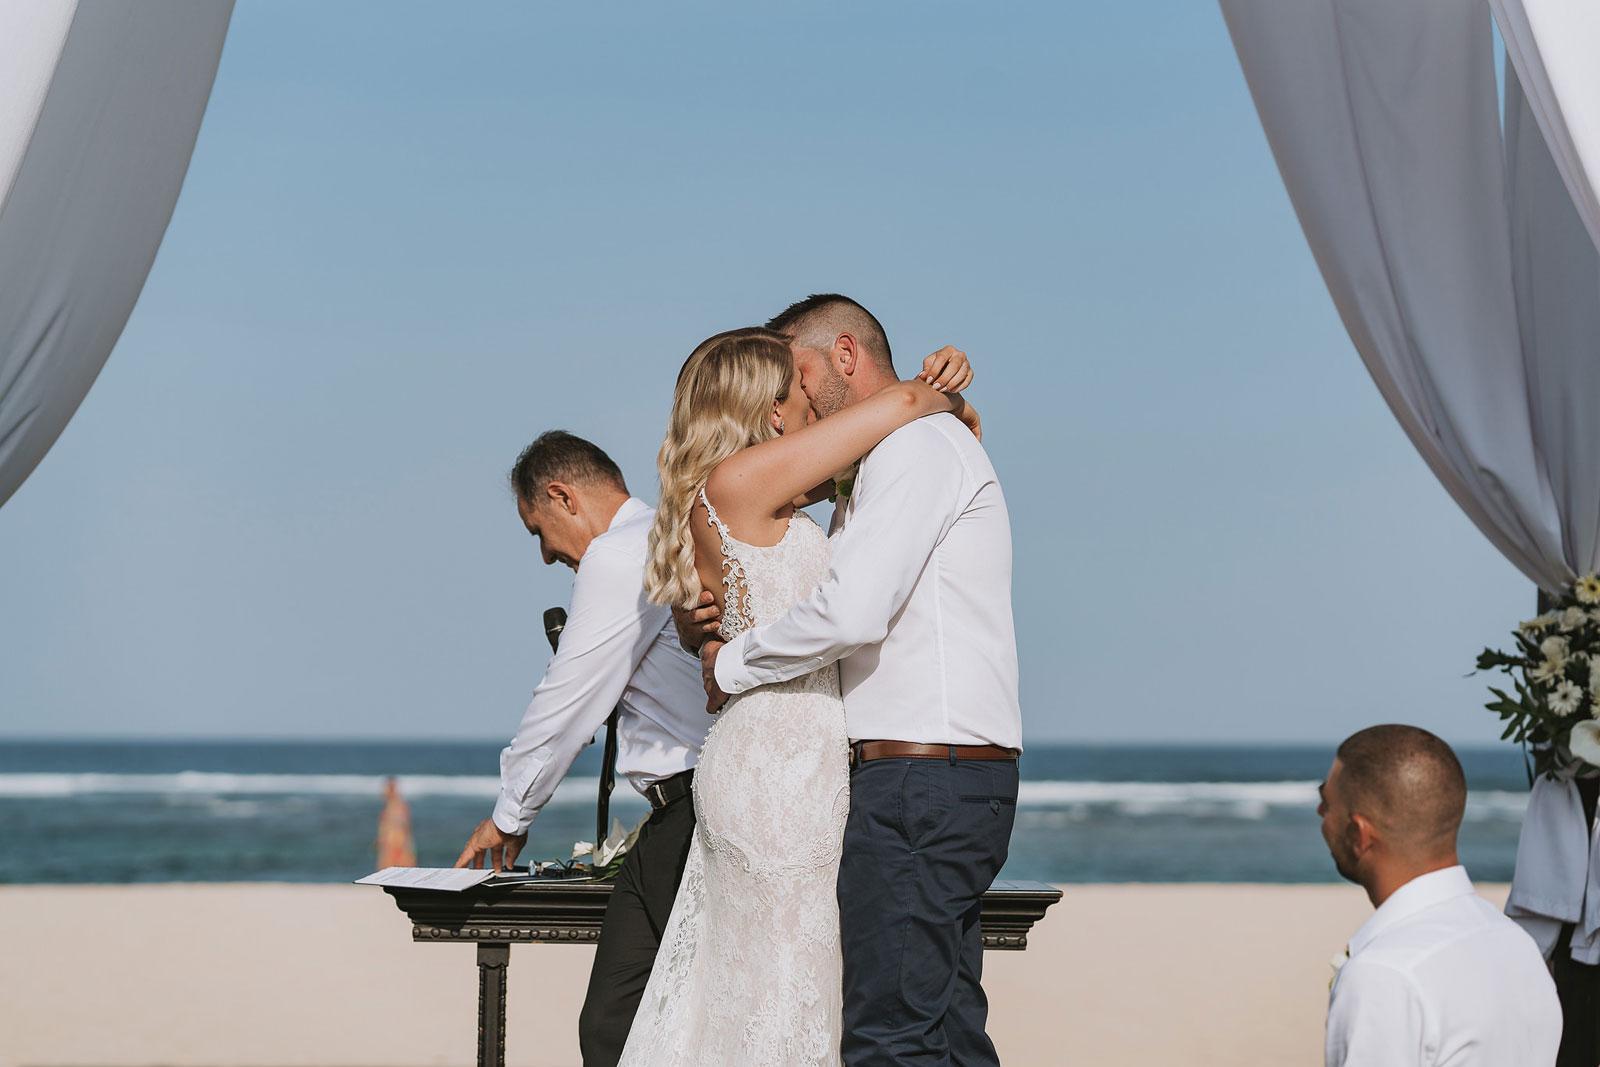 newfound-j-j-bali-nusa-dua-wedding-wedding-photographer-047-a